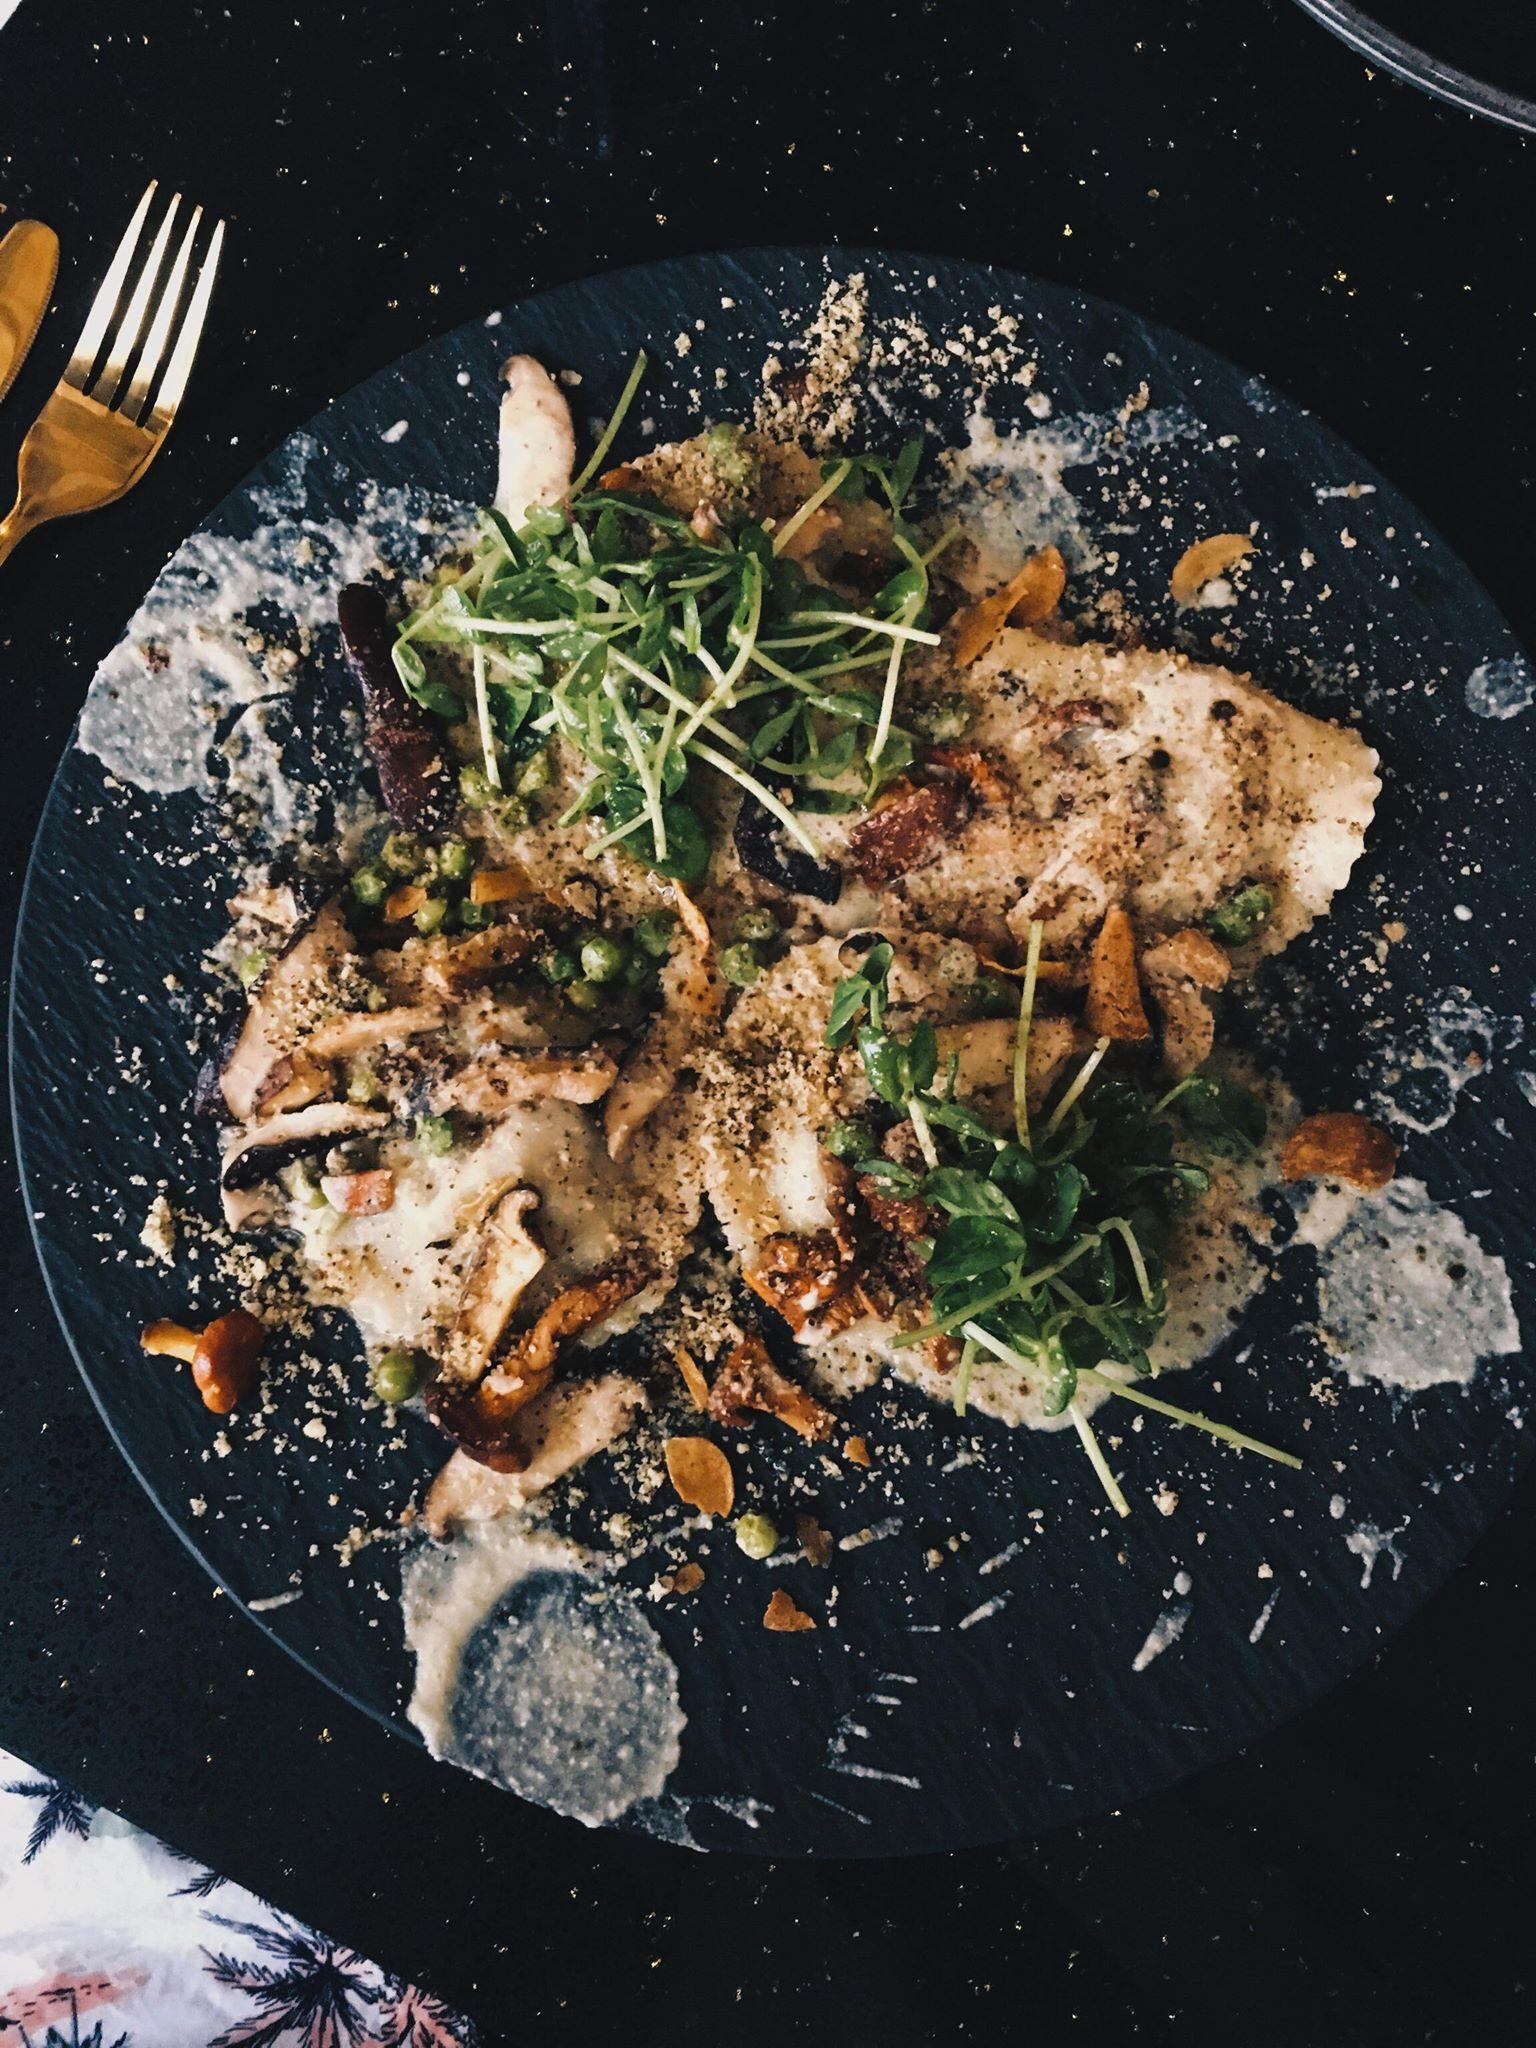 Mushroom Ravioli; Handmade Ravioli, Mushroom Duxelle, Porcini Cream Sauce, Wild Mushroom, Green Peas, Hazelnut Crumb, Baby Greens, Garlic Chips, Truffled Lemon Vinaigrette, Porcini Dust